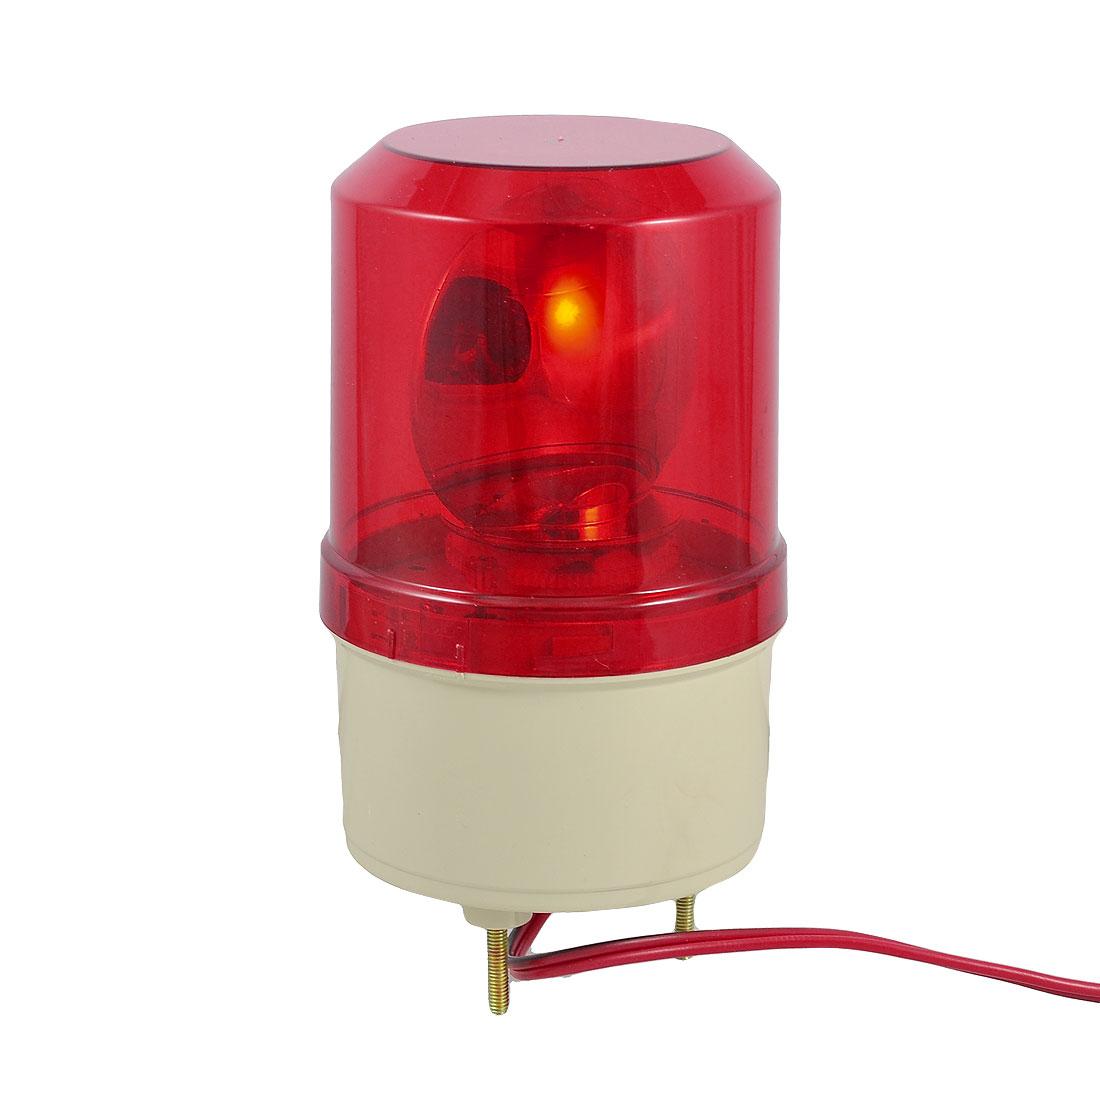 DC 24V 5W Red Rotating Flash Light Industrial Signal Warning Lamp Rmoyb